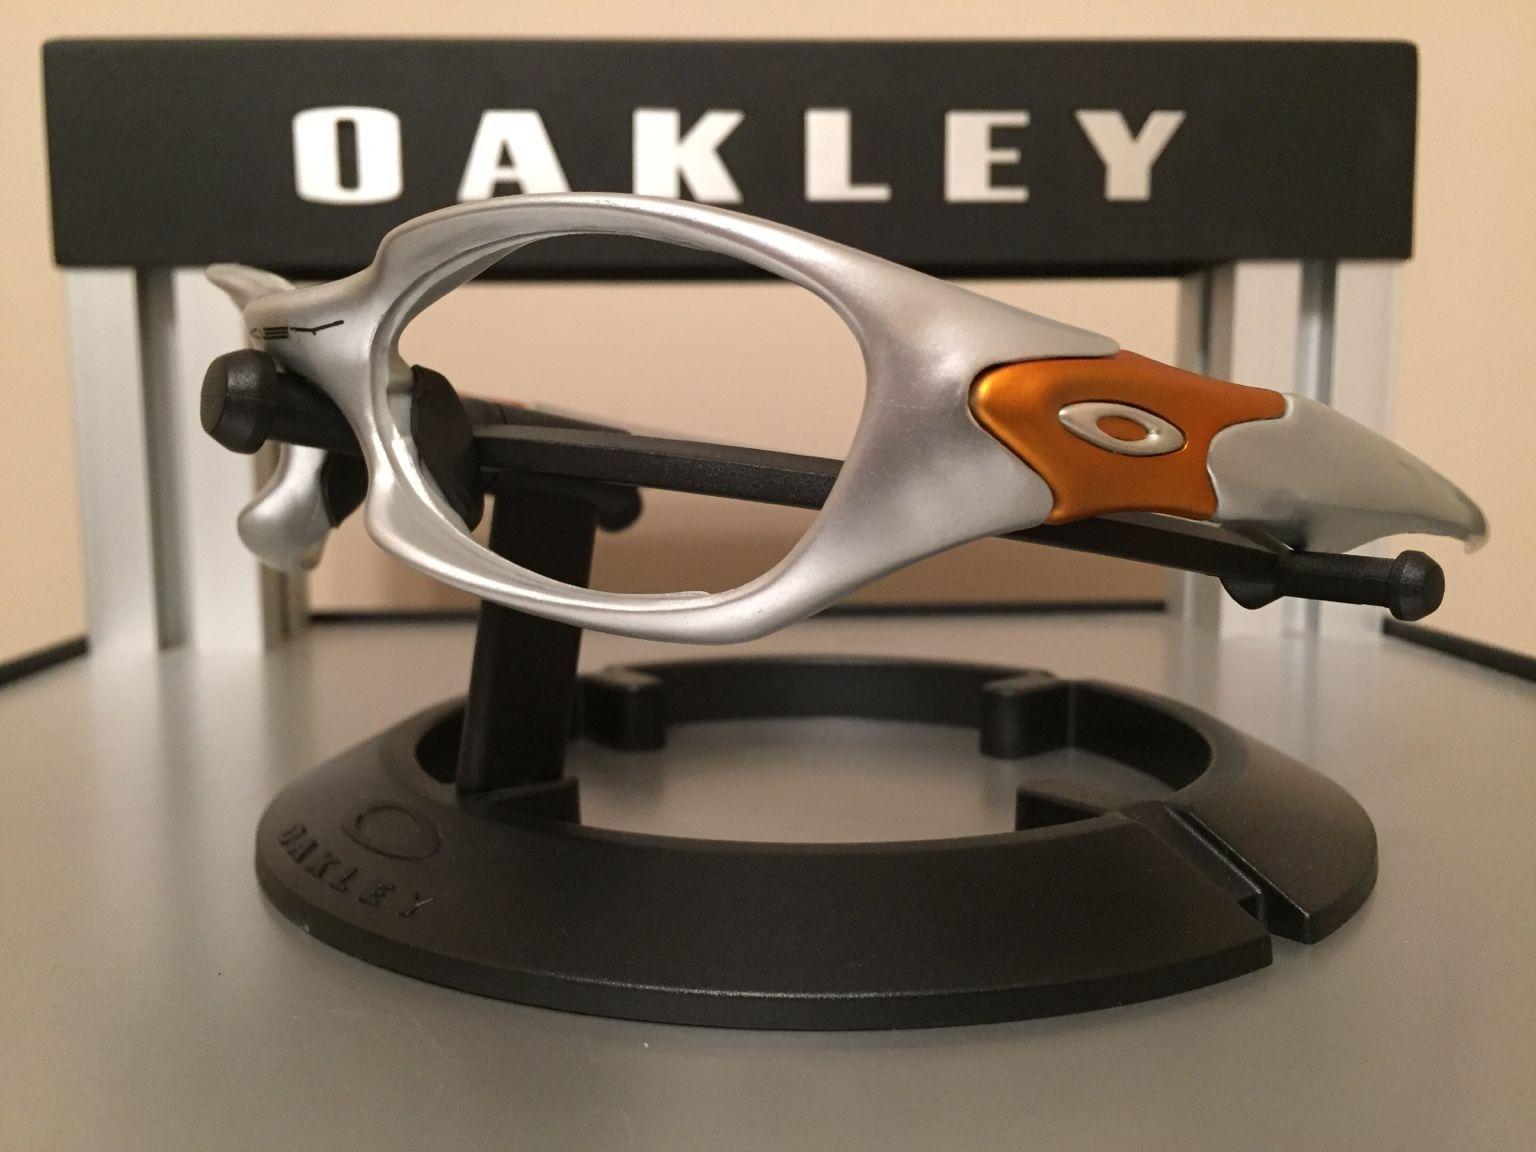 Oakley Valve 1.0 Bundle.......$110 - 577f4721d3d3ca7bfbe85c5057336992.jpg